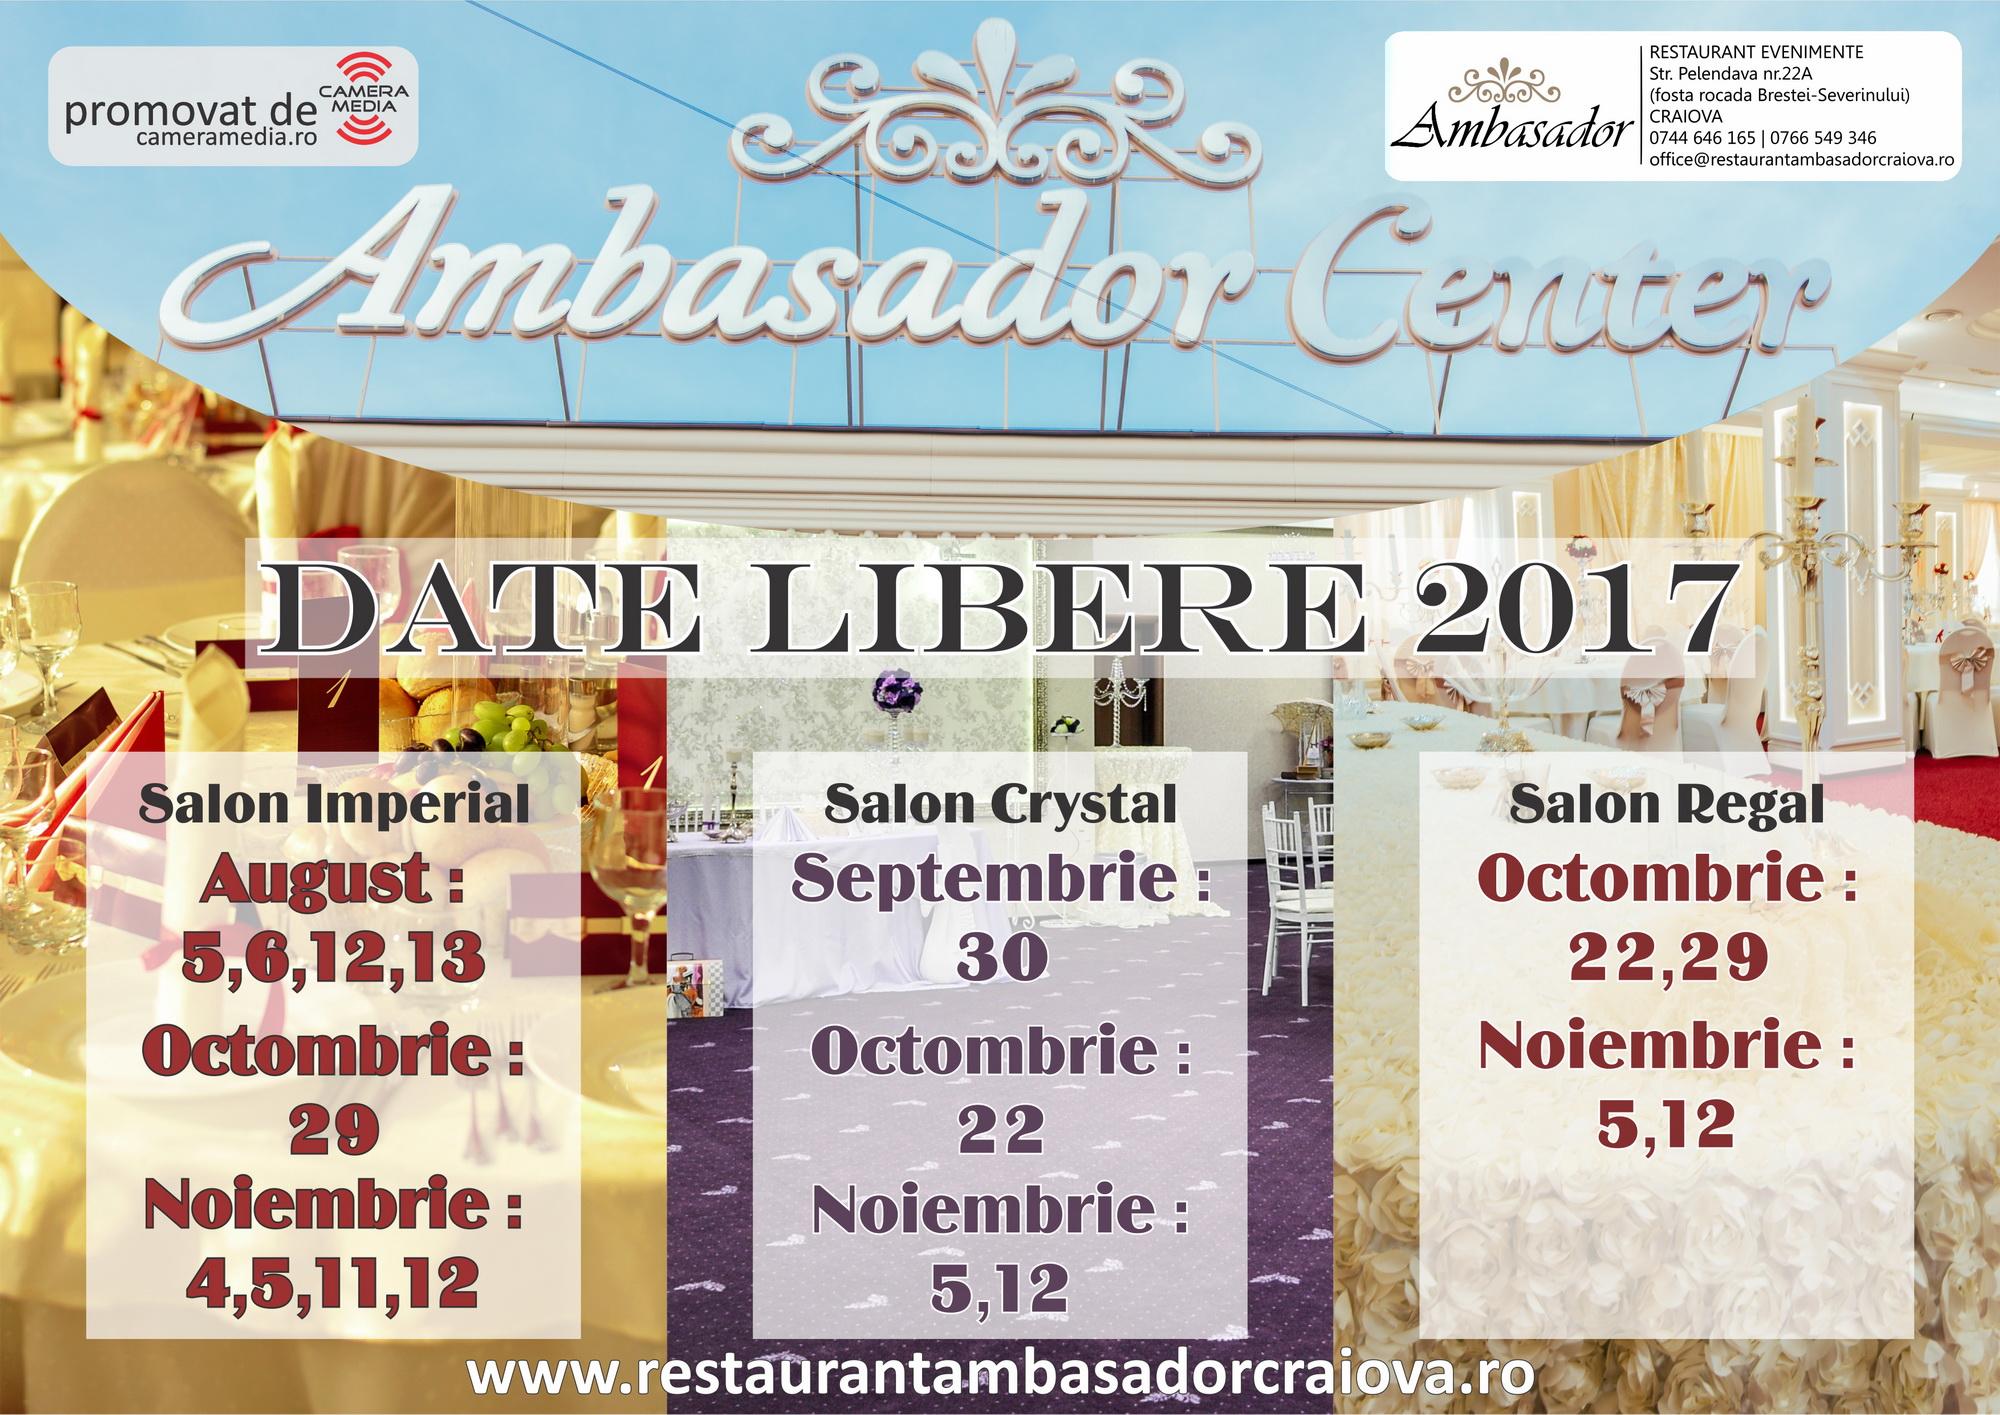 Oferta Date Libere Restaurant Craiova 2017 l Salon REGAL , CRYSTAL, IMPERIAL l Restaurant Nunta Craiova l Restaurant Ambasador Craiova